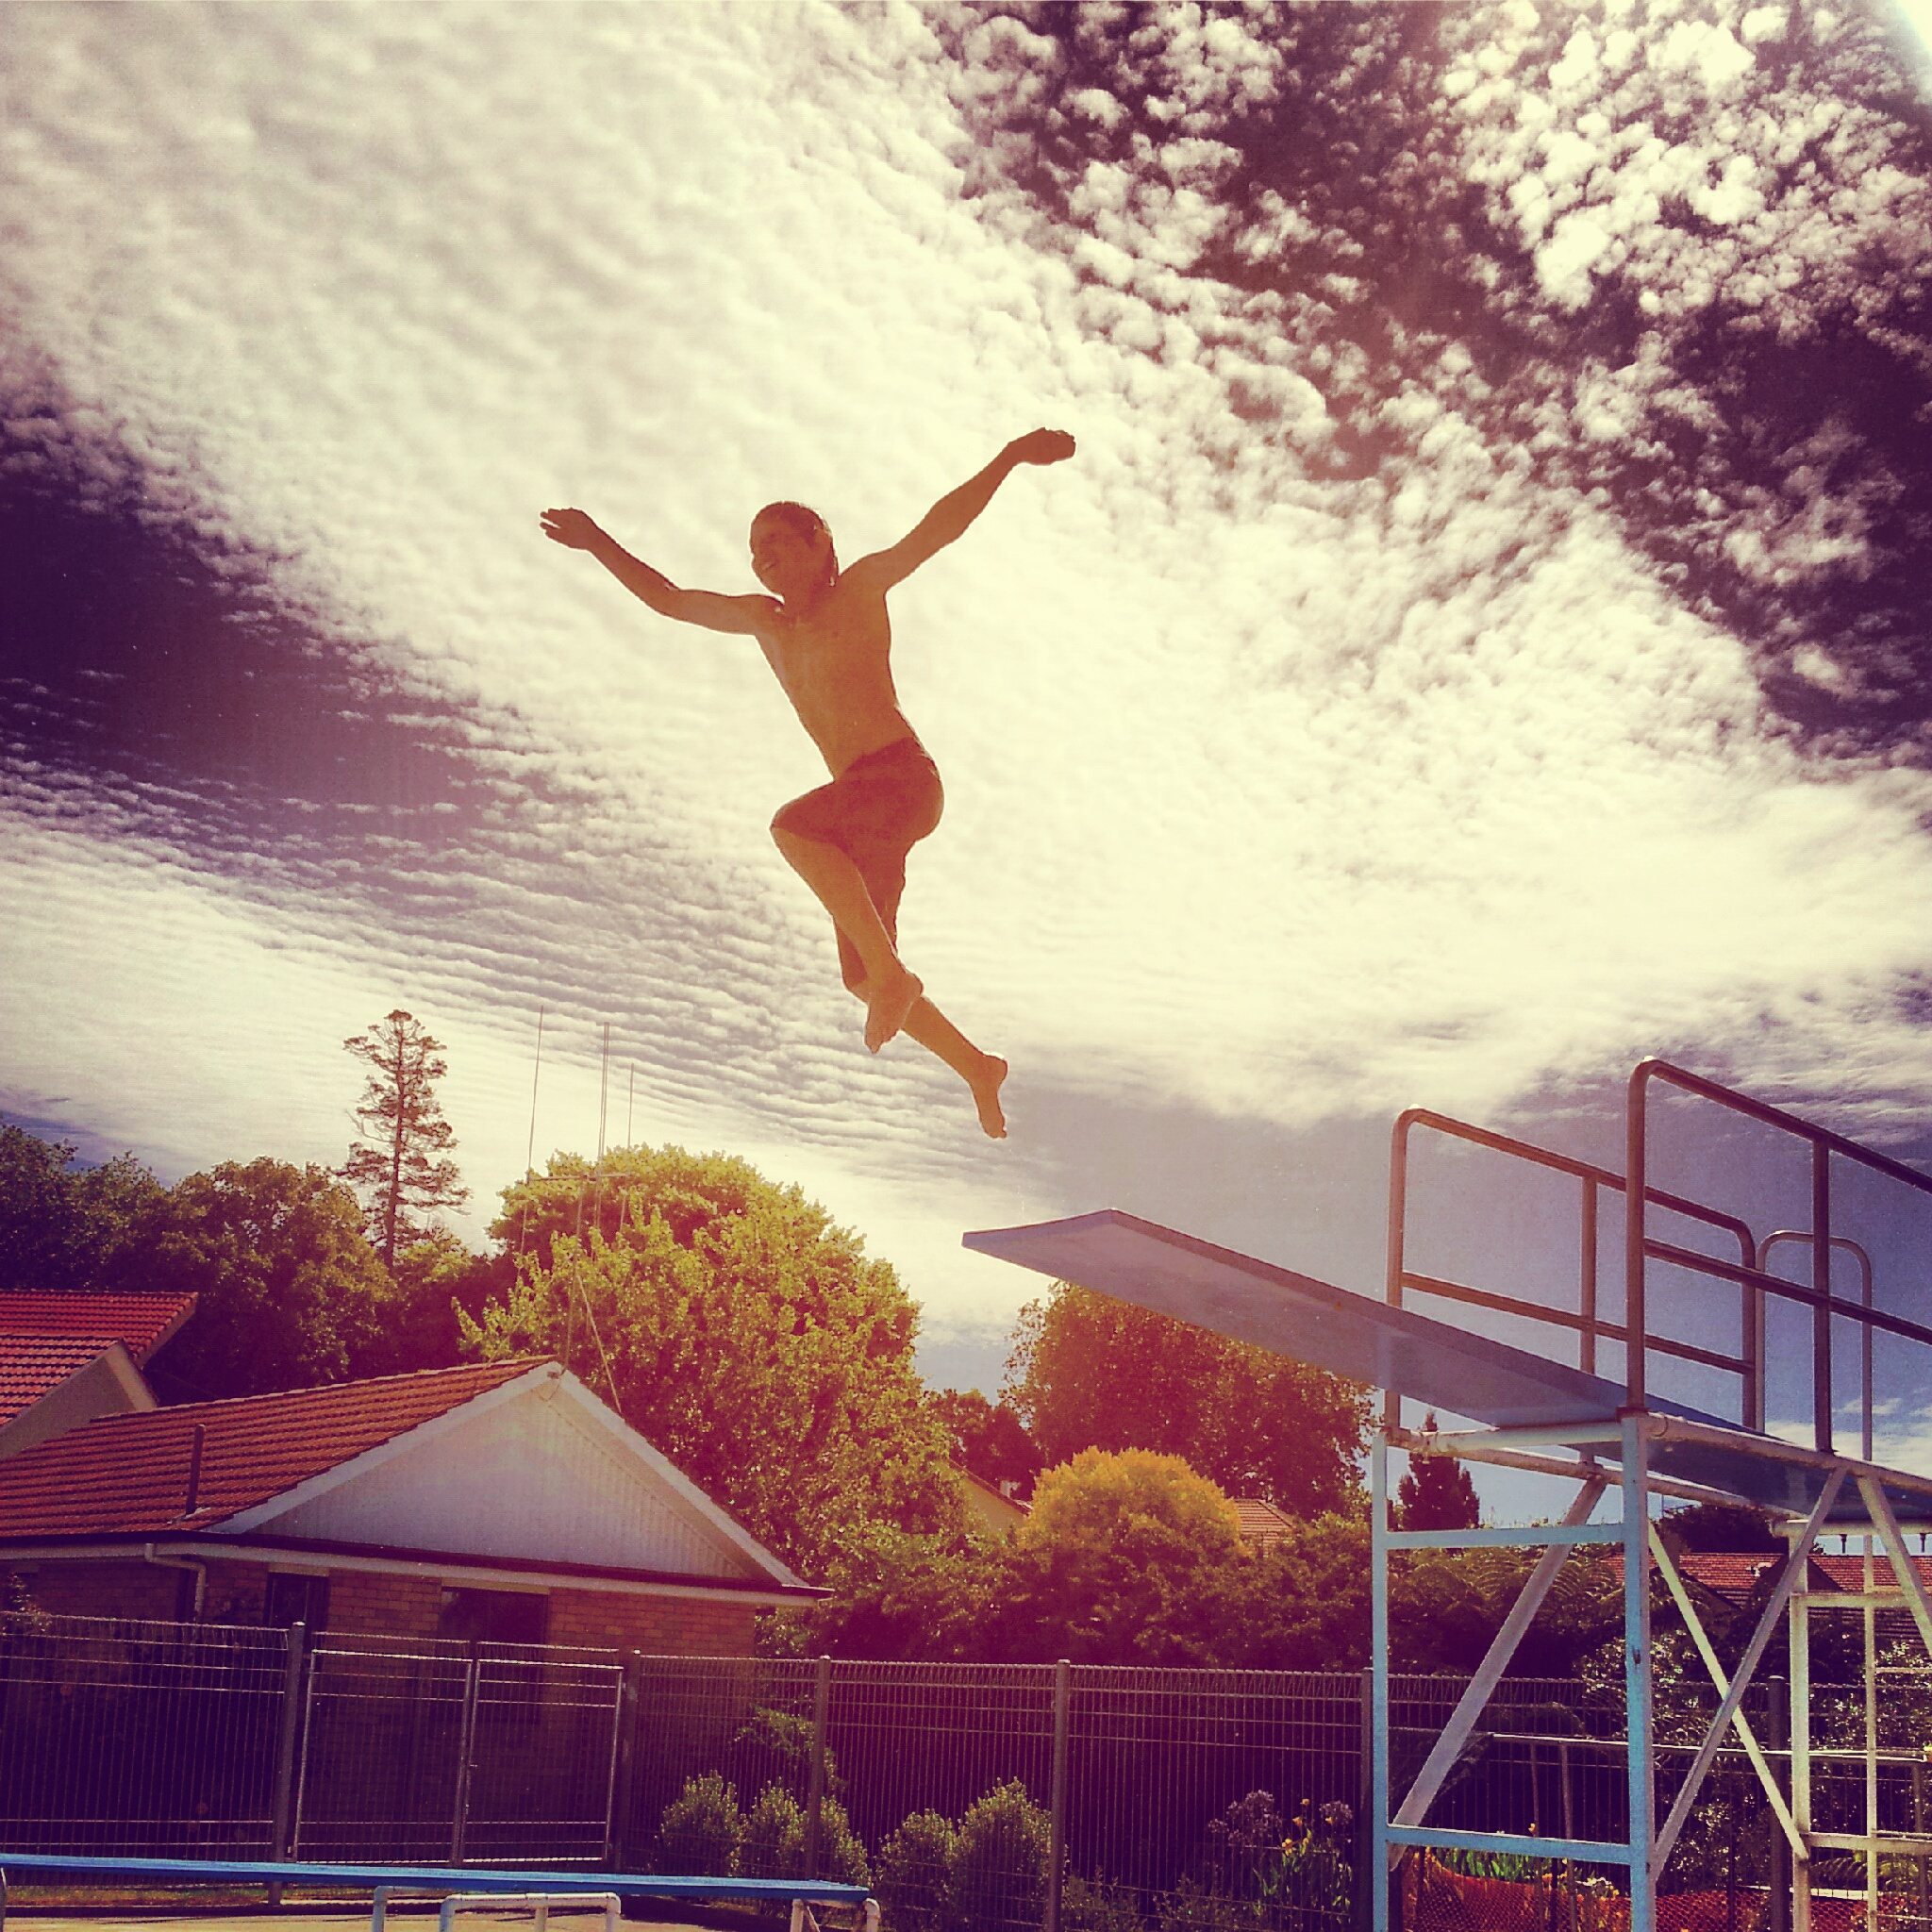 Edcmooc inbox a box of thistles - Swimming pool diving board regulations ...